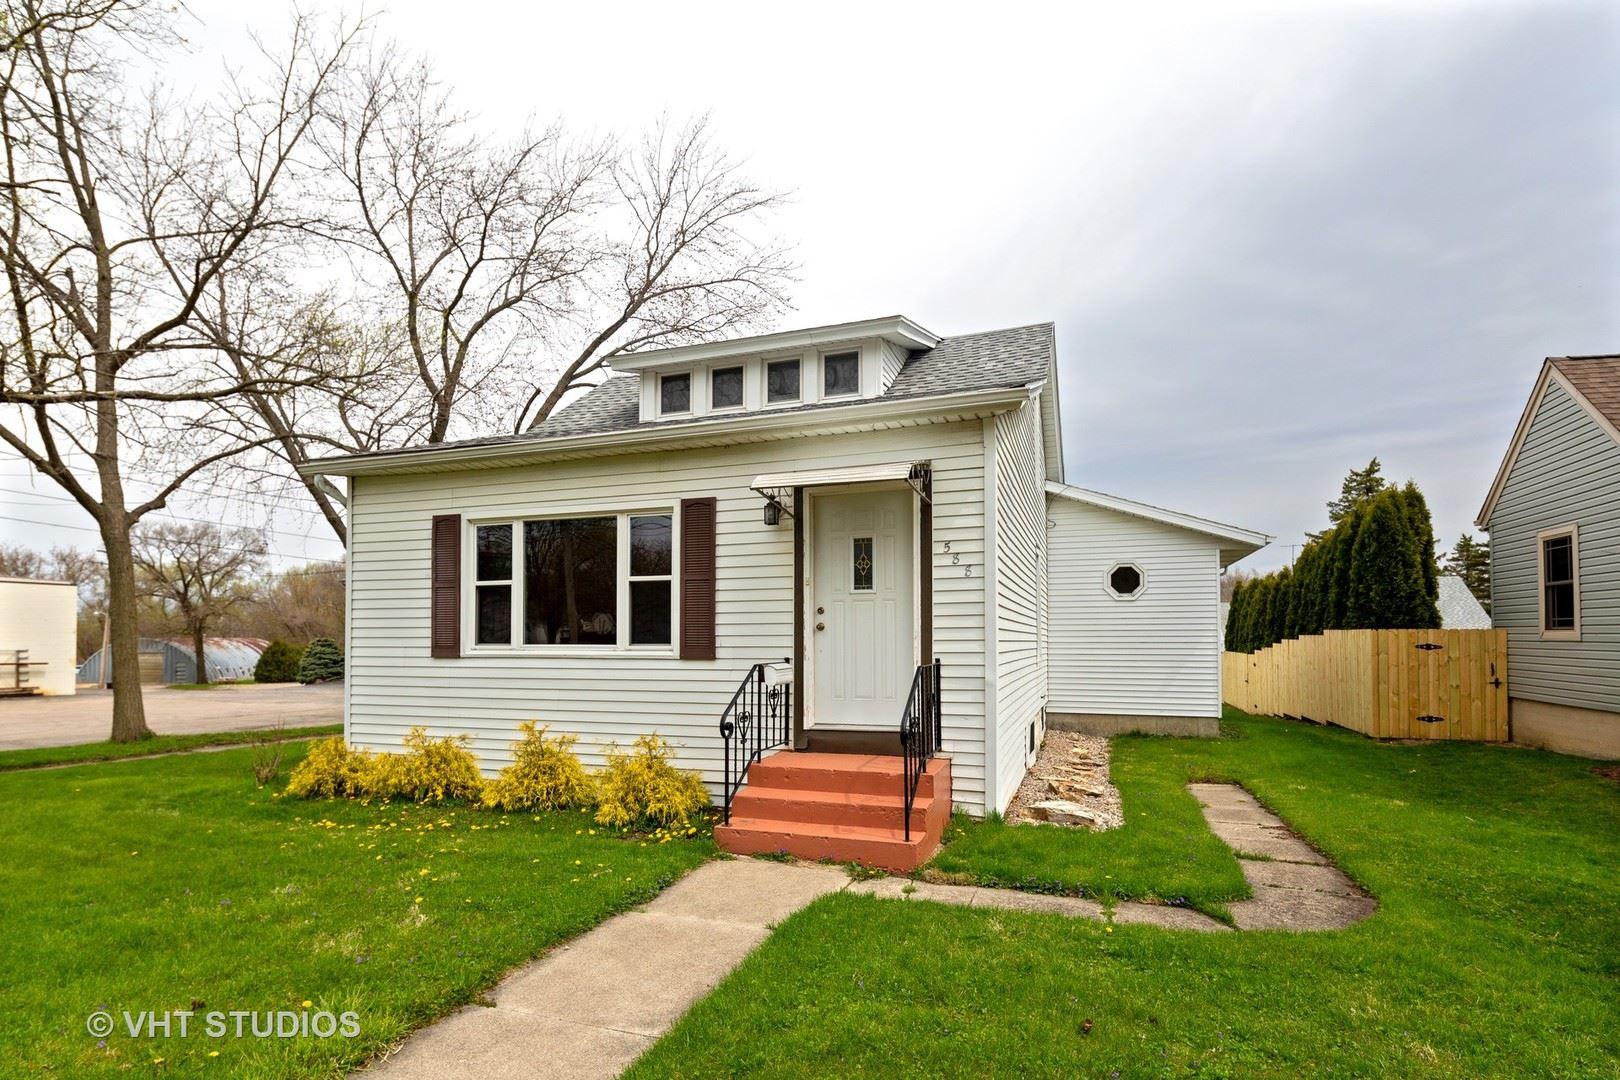 588 Washington Street, Woodstock, IL 60098 - #: 10700605